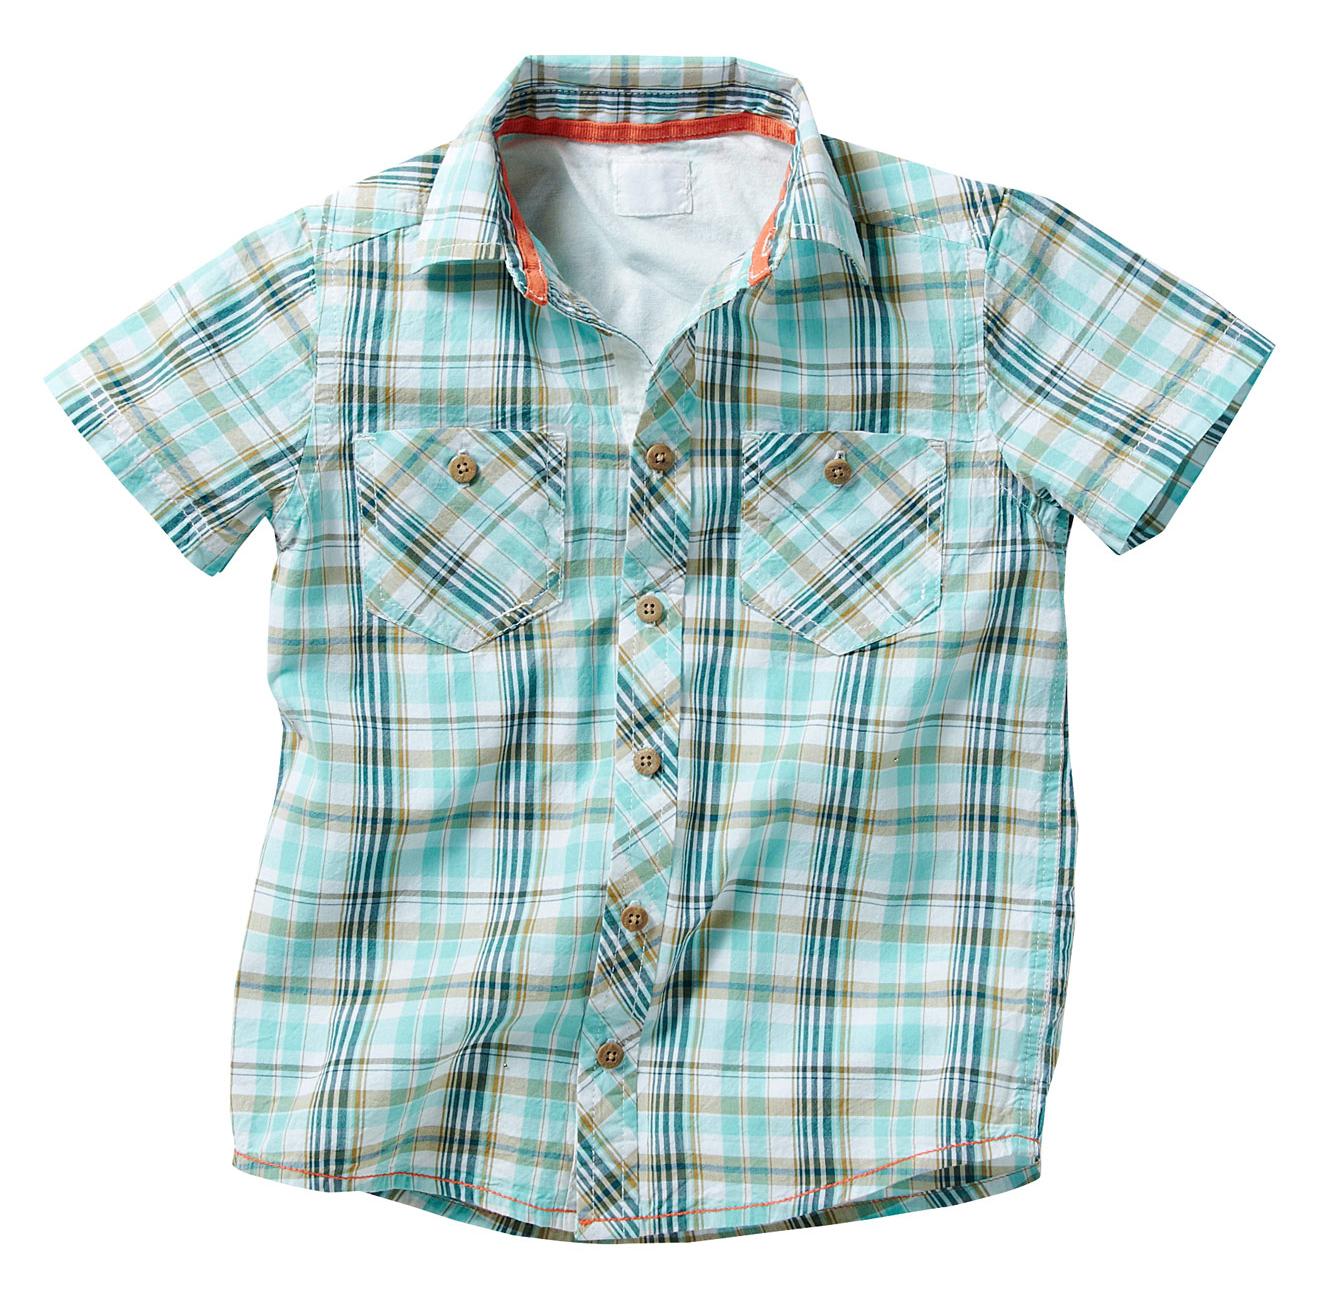 Сорочка на мальчика 3 года выкройка фото 834